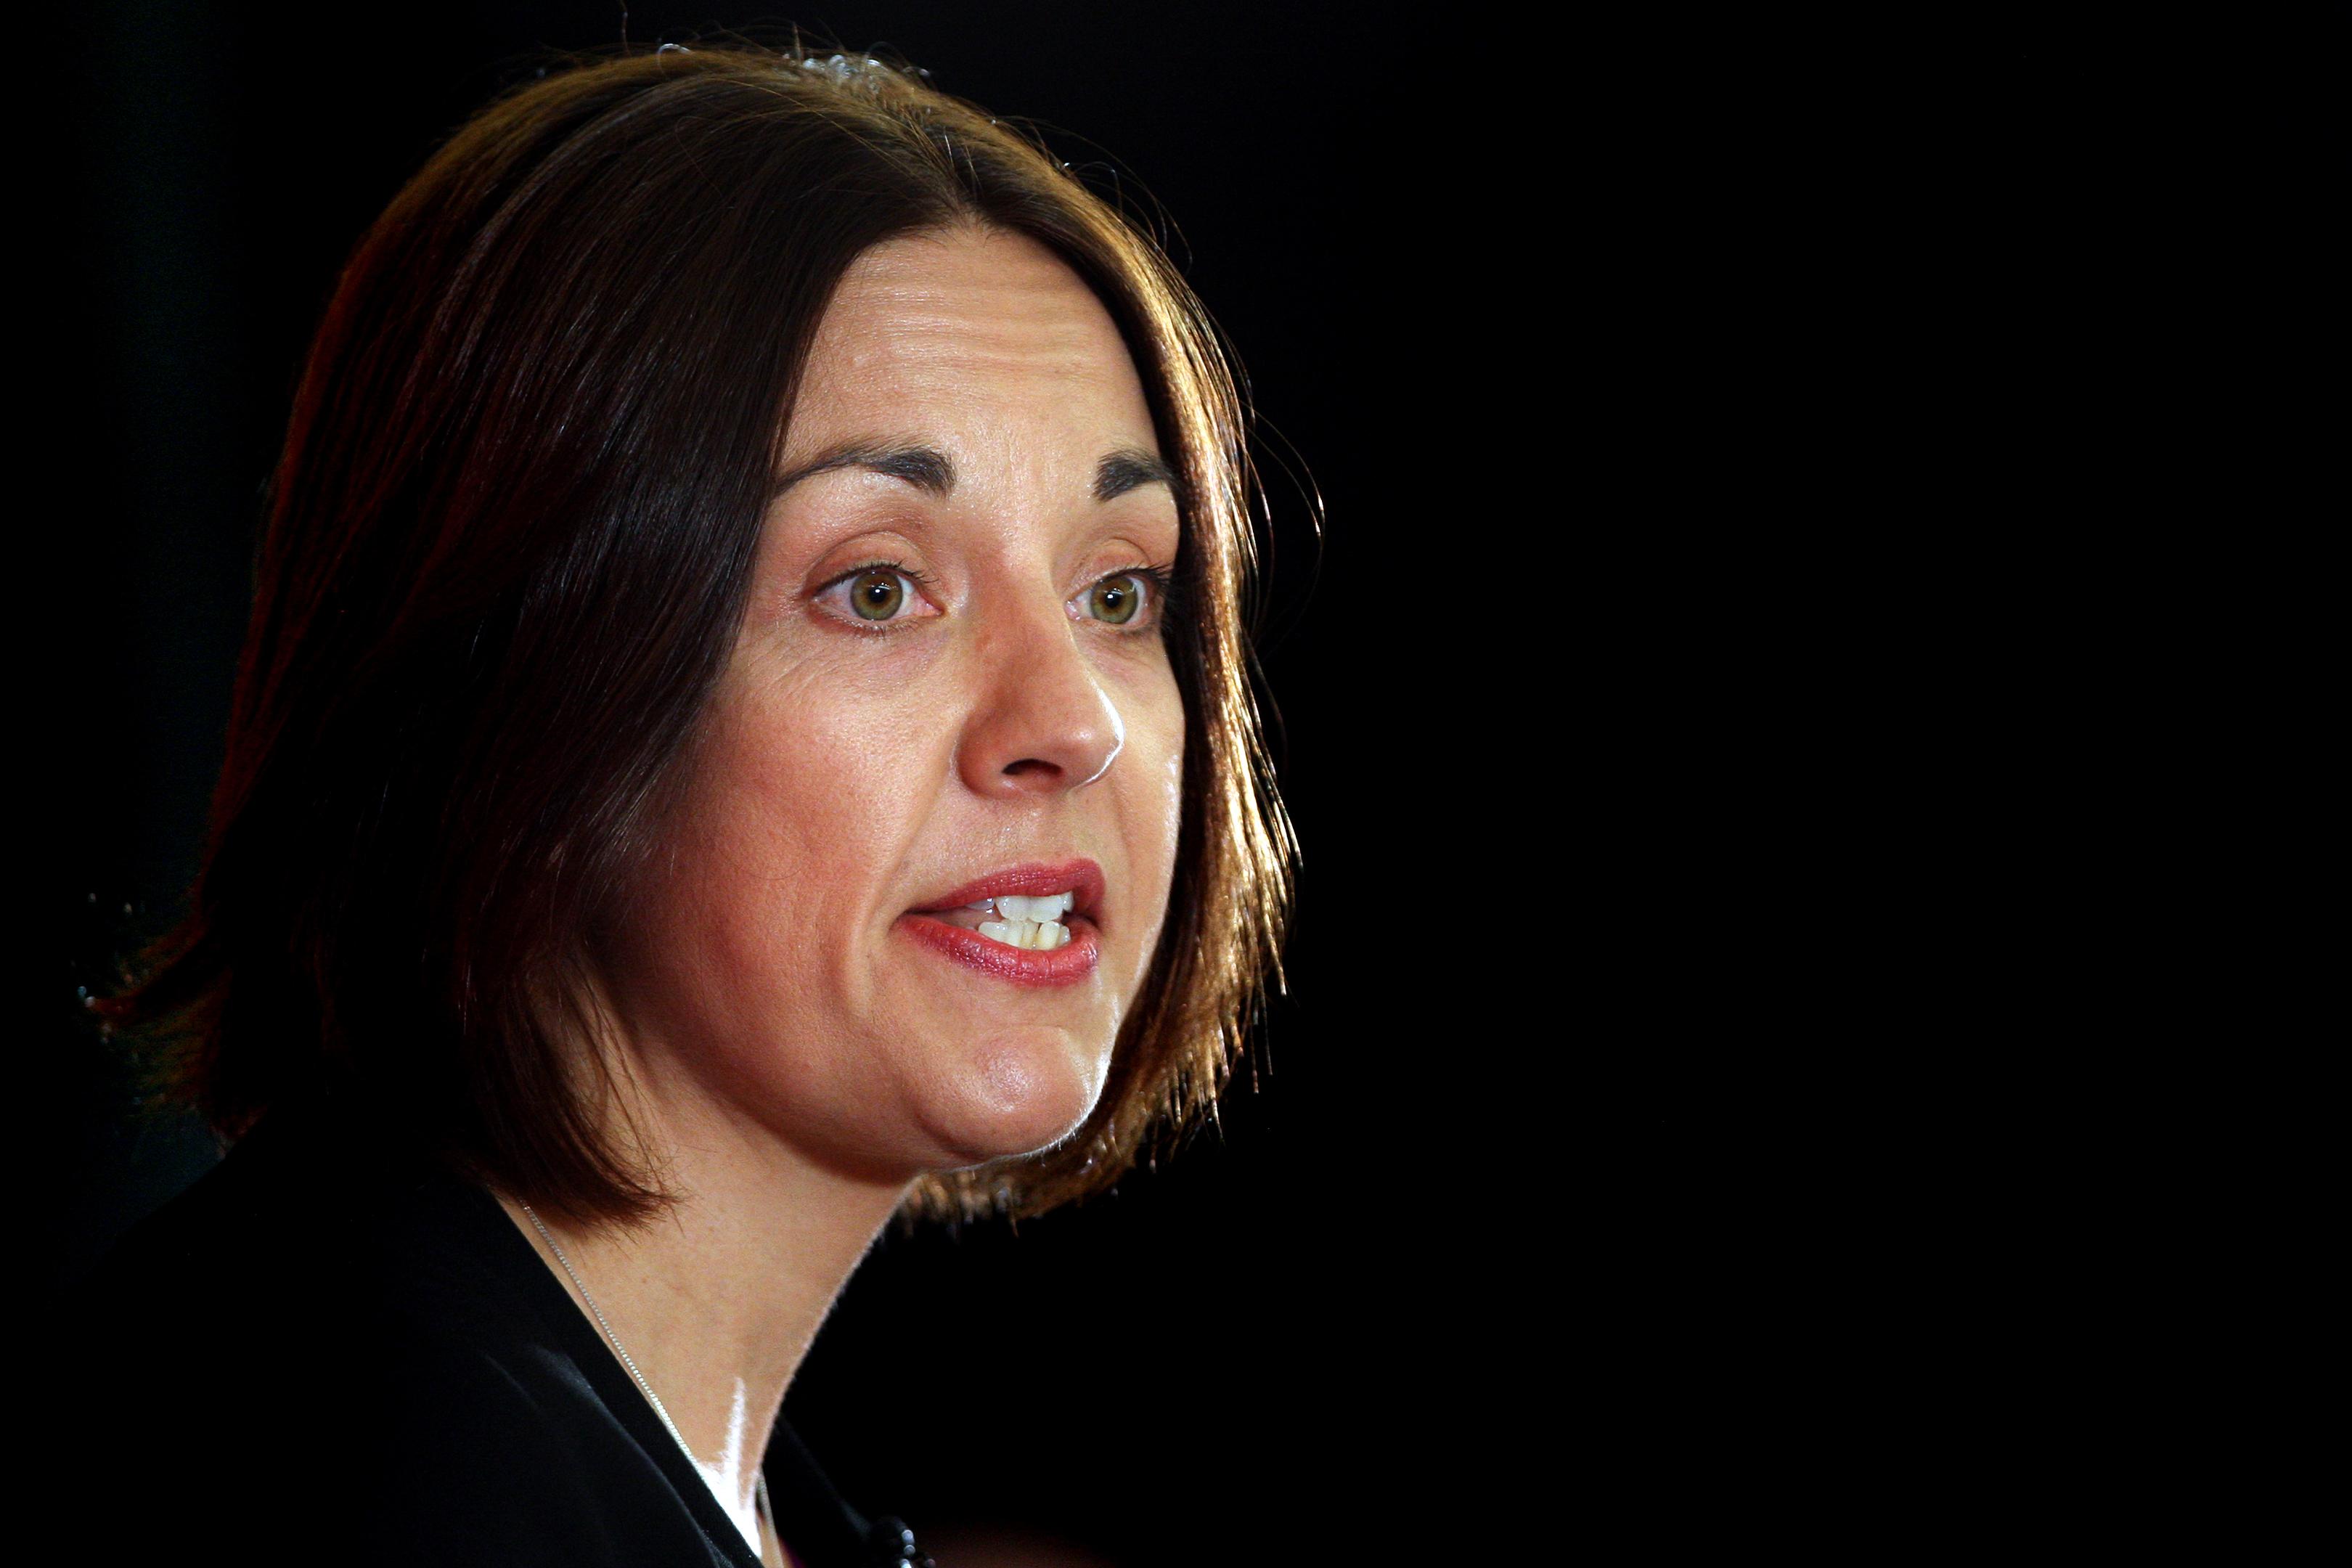 Scottish Labour leader Kezia Dugdale (Kris Miller/DC Thomson)